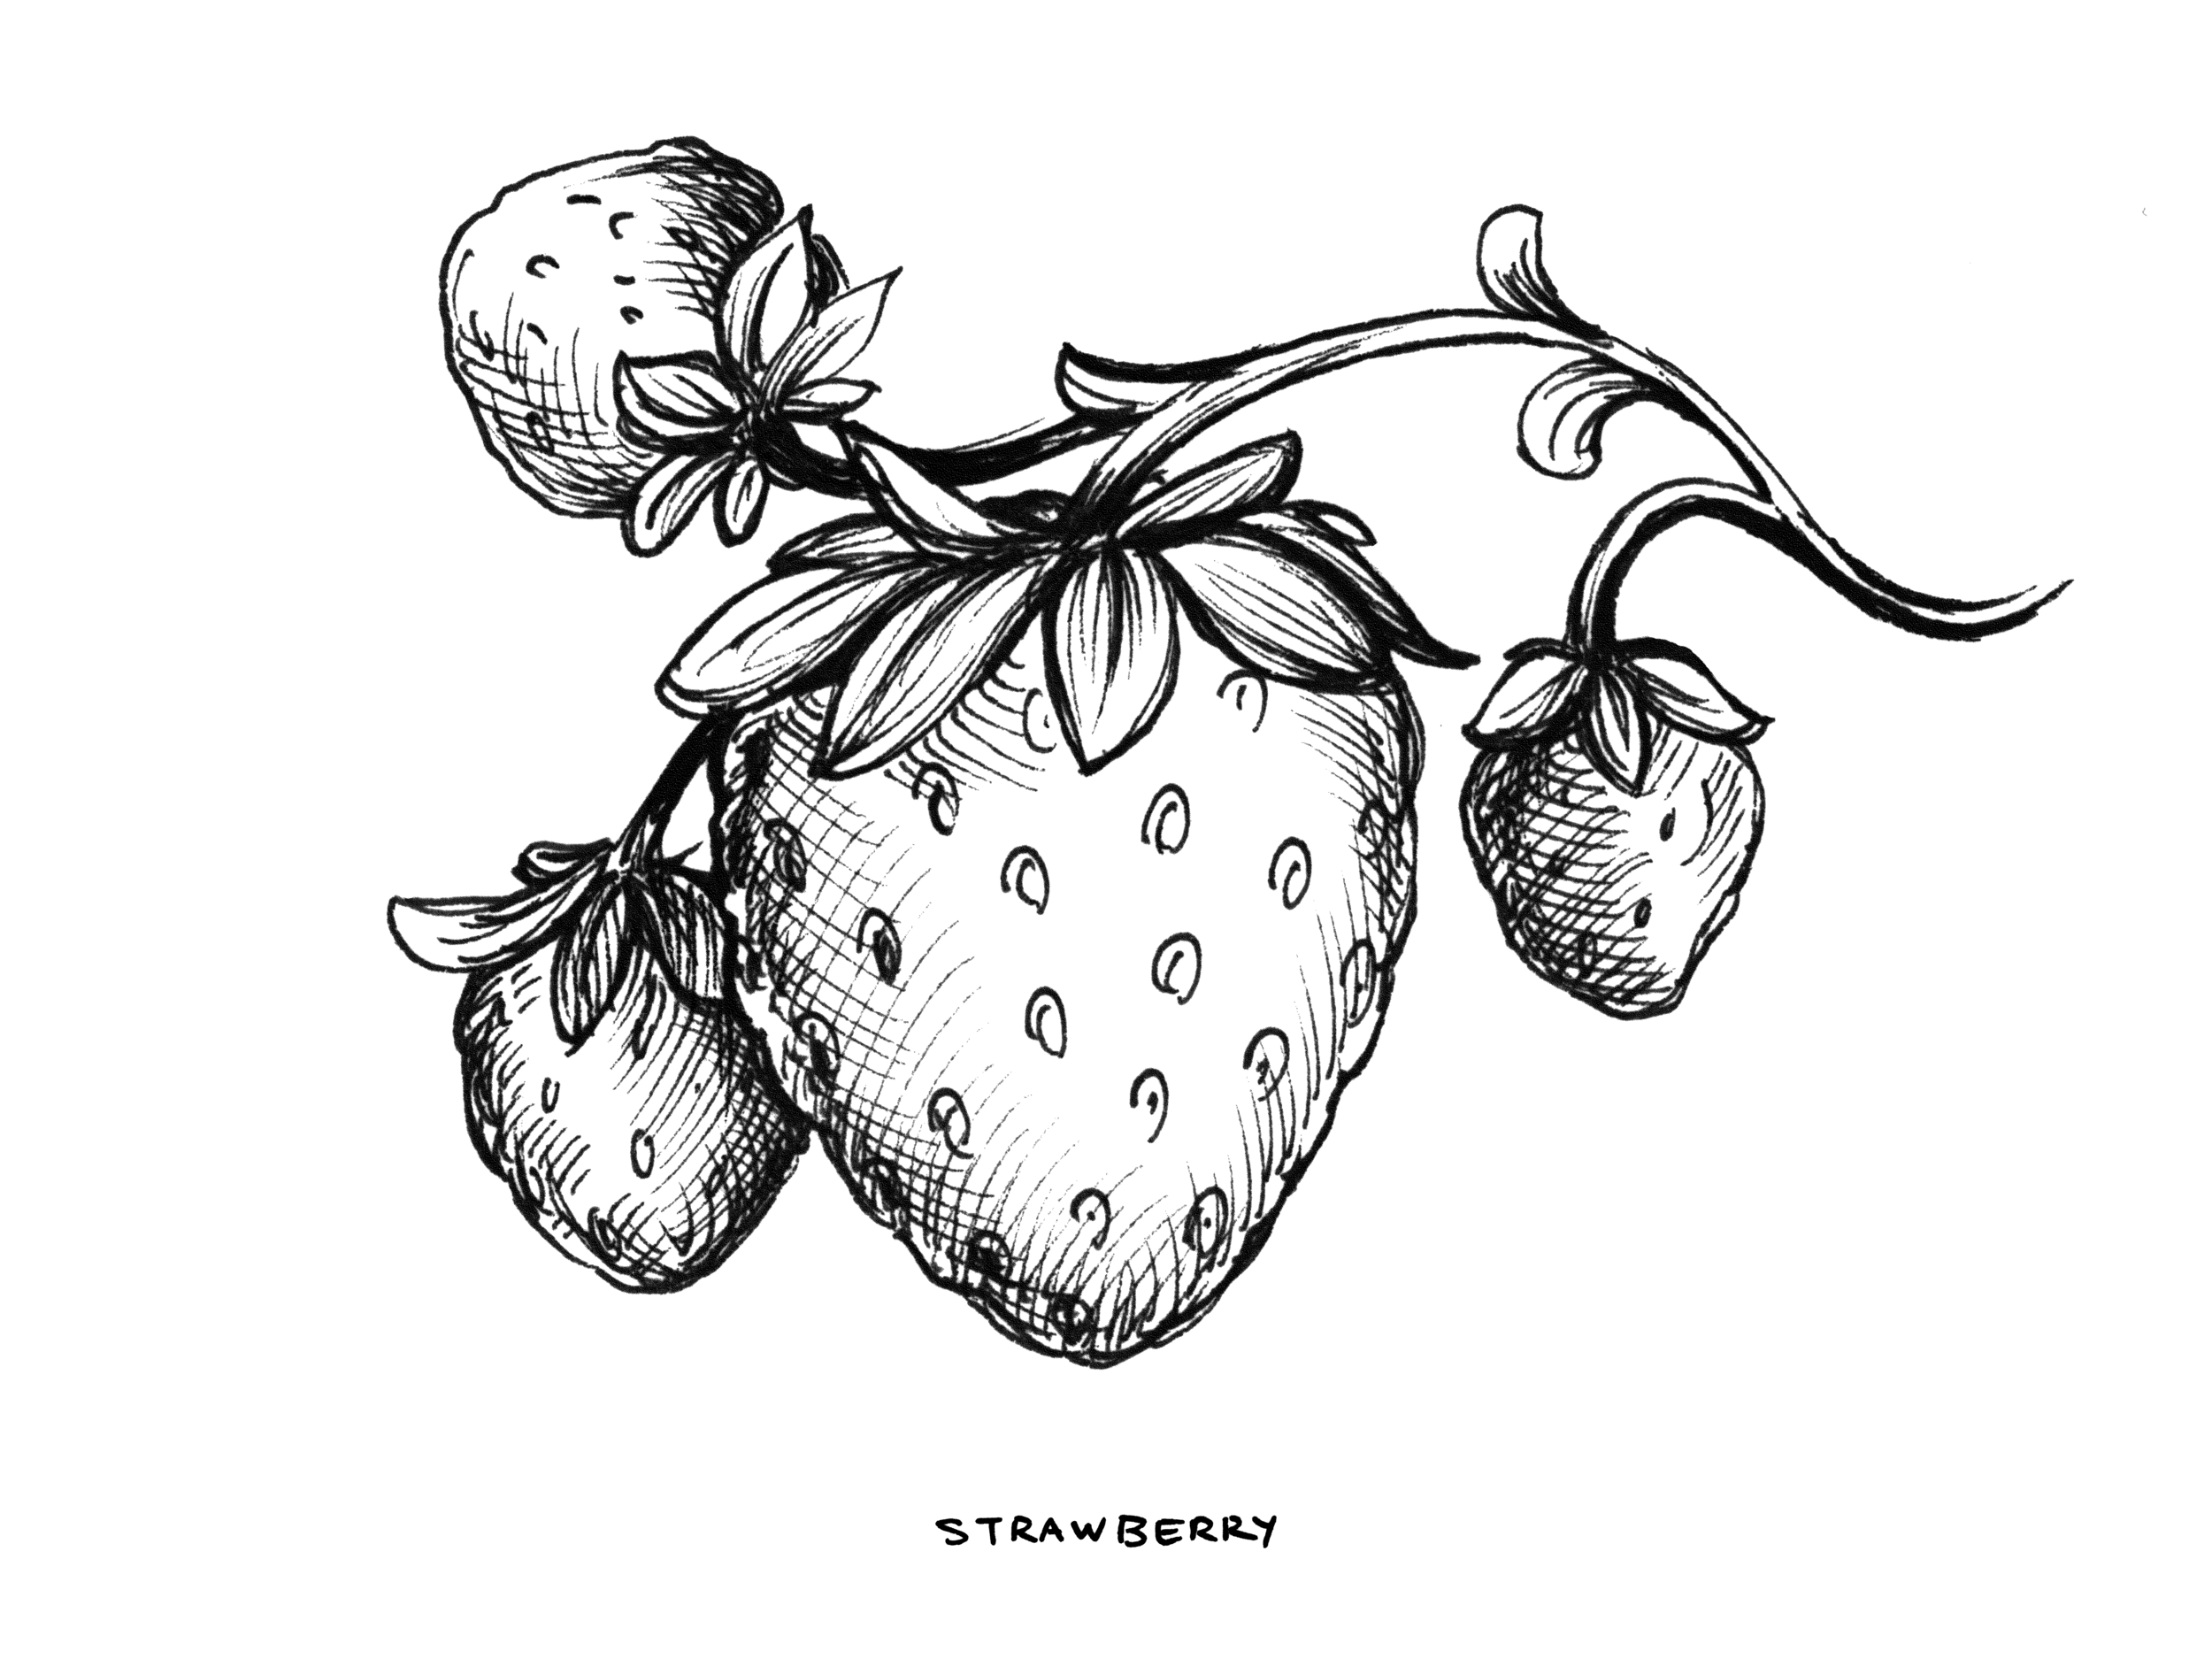 Strawberry_StrainArt.png